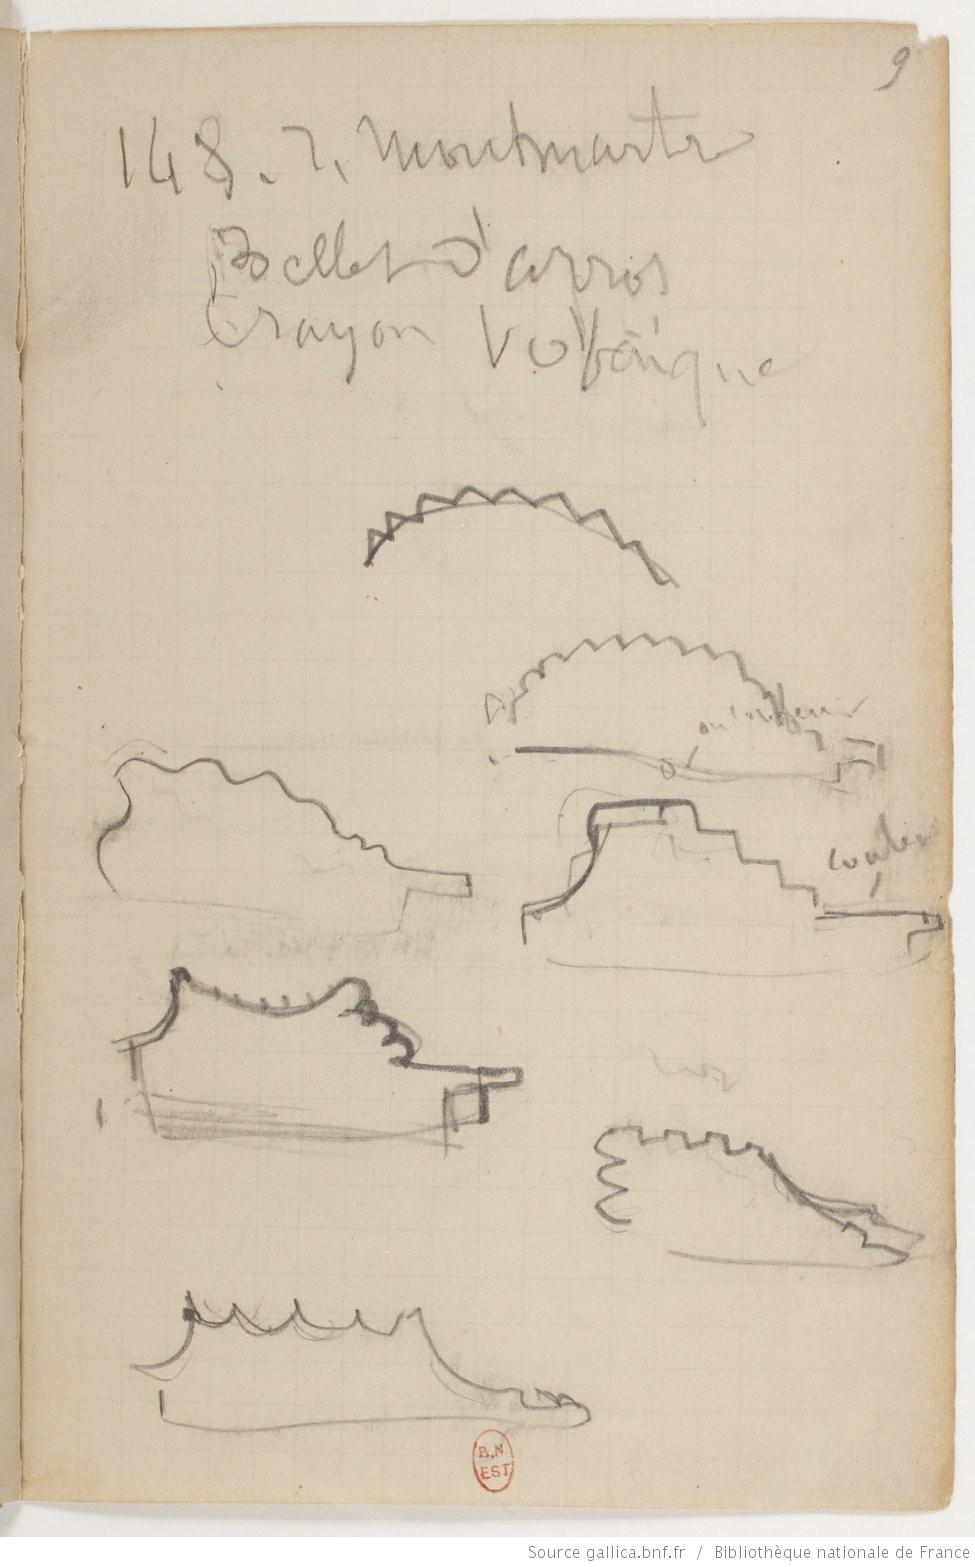 Рис.2 Эдгар Дега,Записная книжка 23, стр.9, 1878-79.